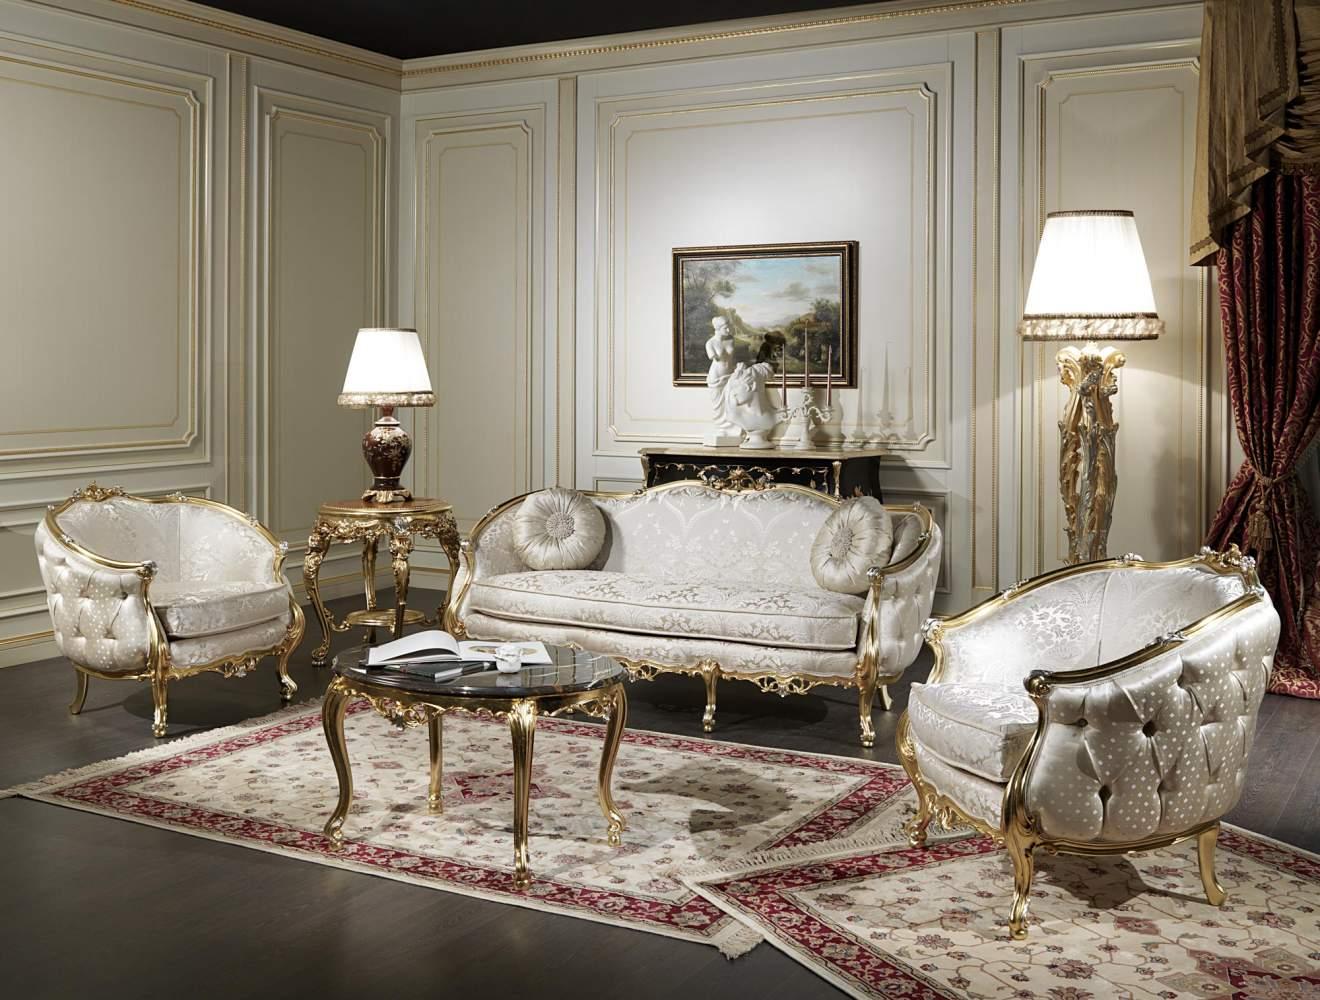 Venezia luxury classic living room